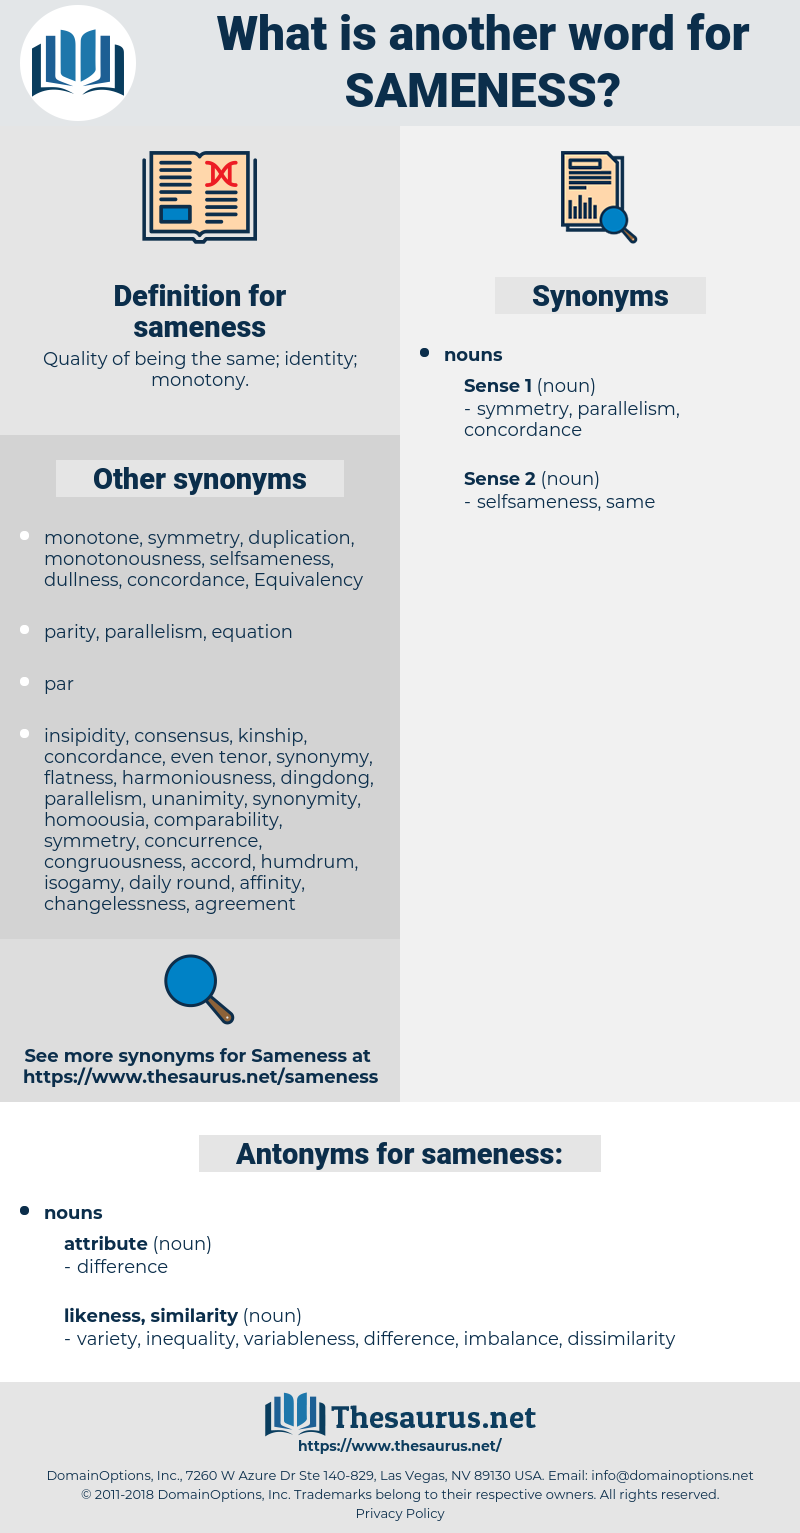 sameness, synonym sameness, another word for sameness, words like sameness, thesaurus sameness